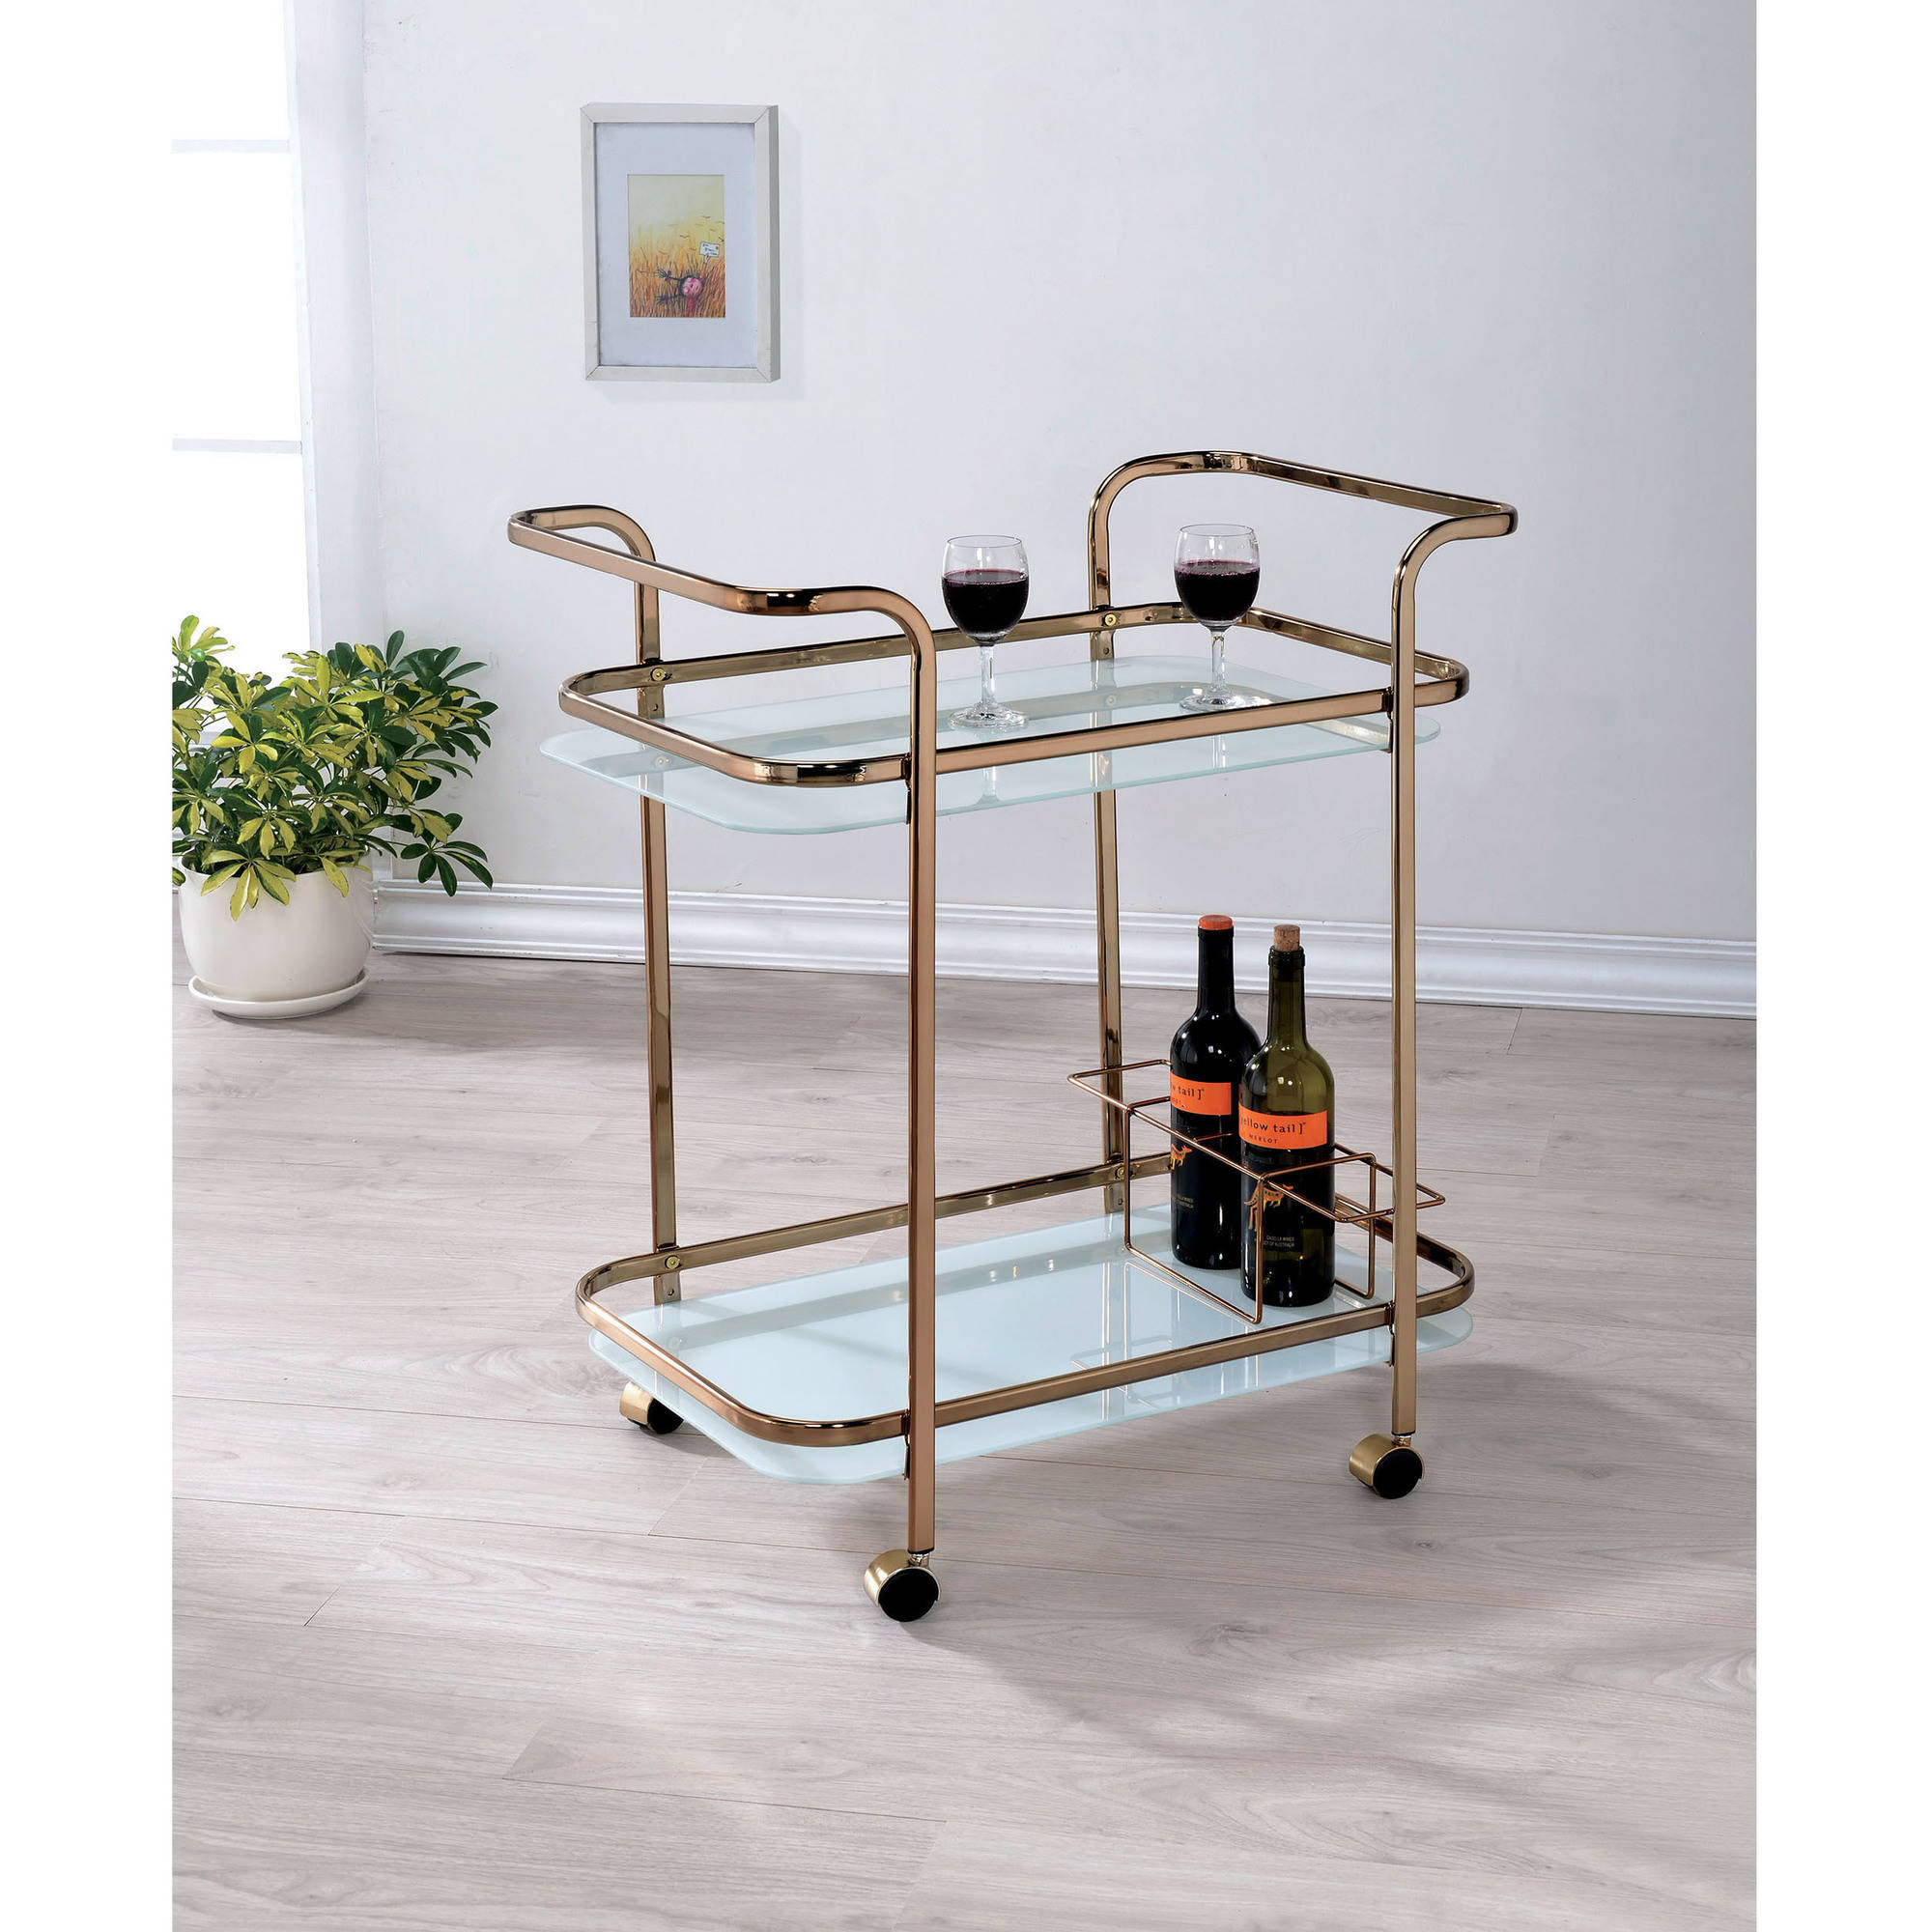 Furniture of America Loike Modern 2-Shelf Serving Cart, Champagne